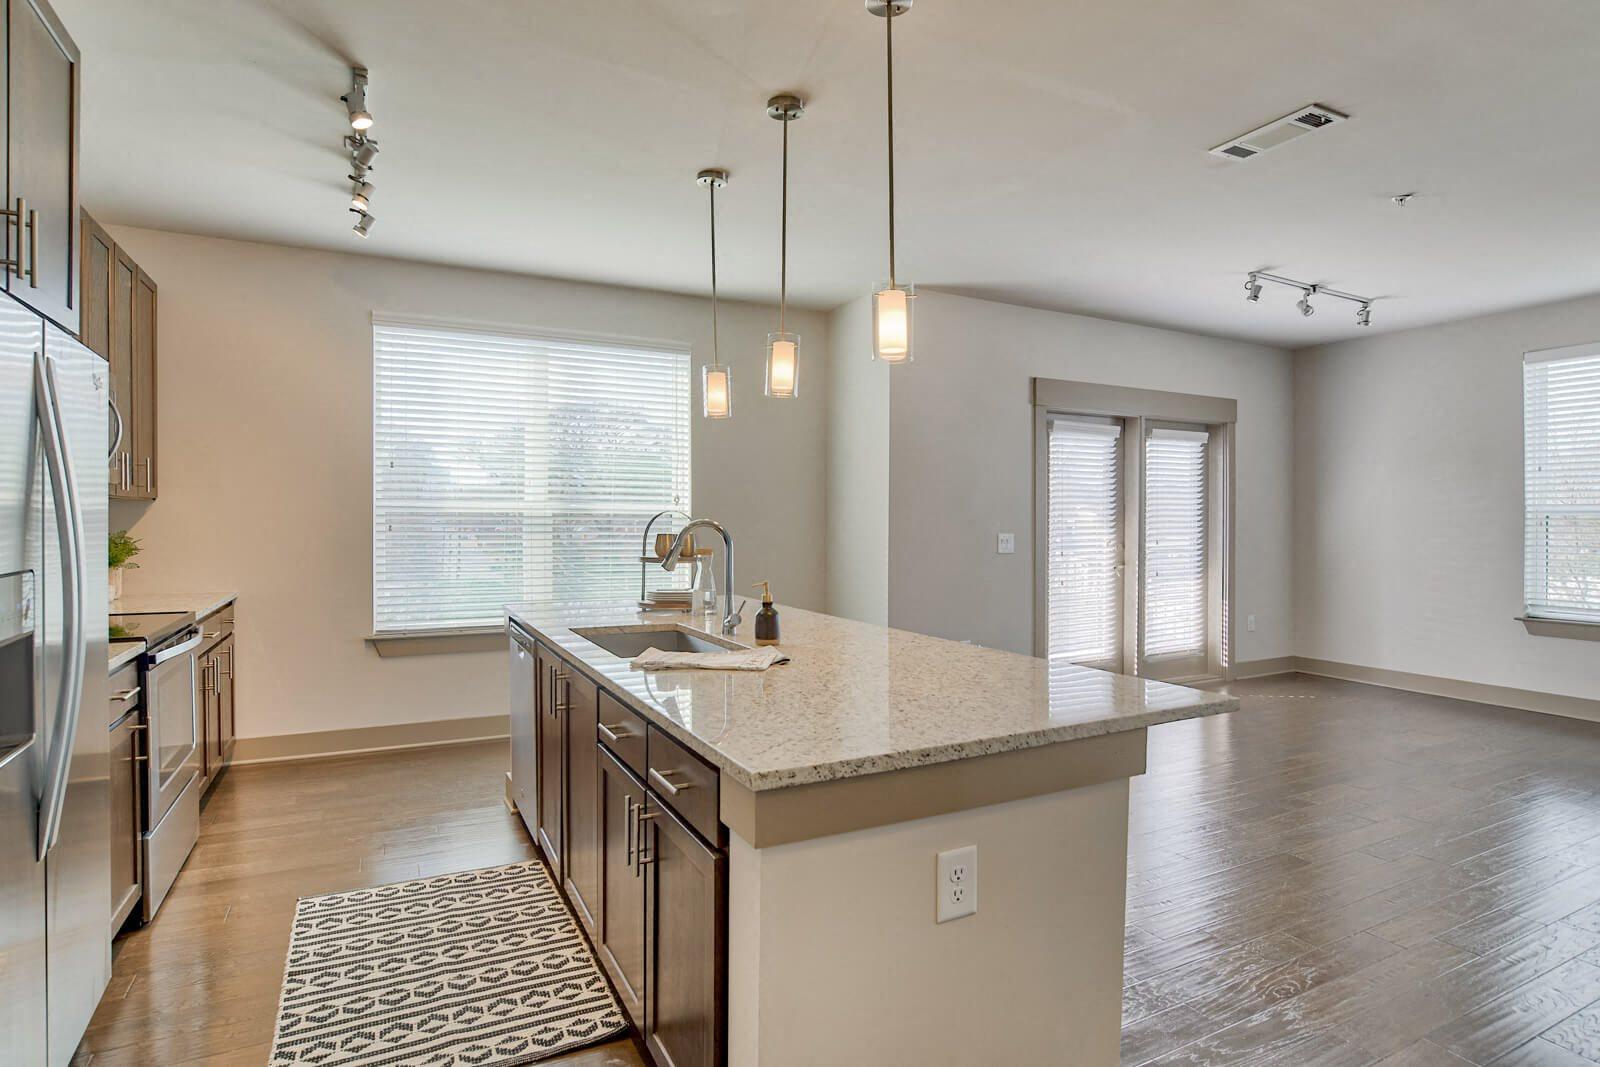 Open Floor Plans Provide Design Flexibility at Windsor Old Fourth Ward, Atlanta, 30312